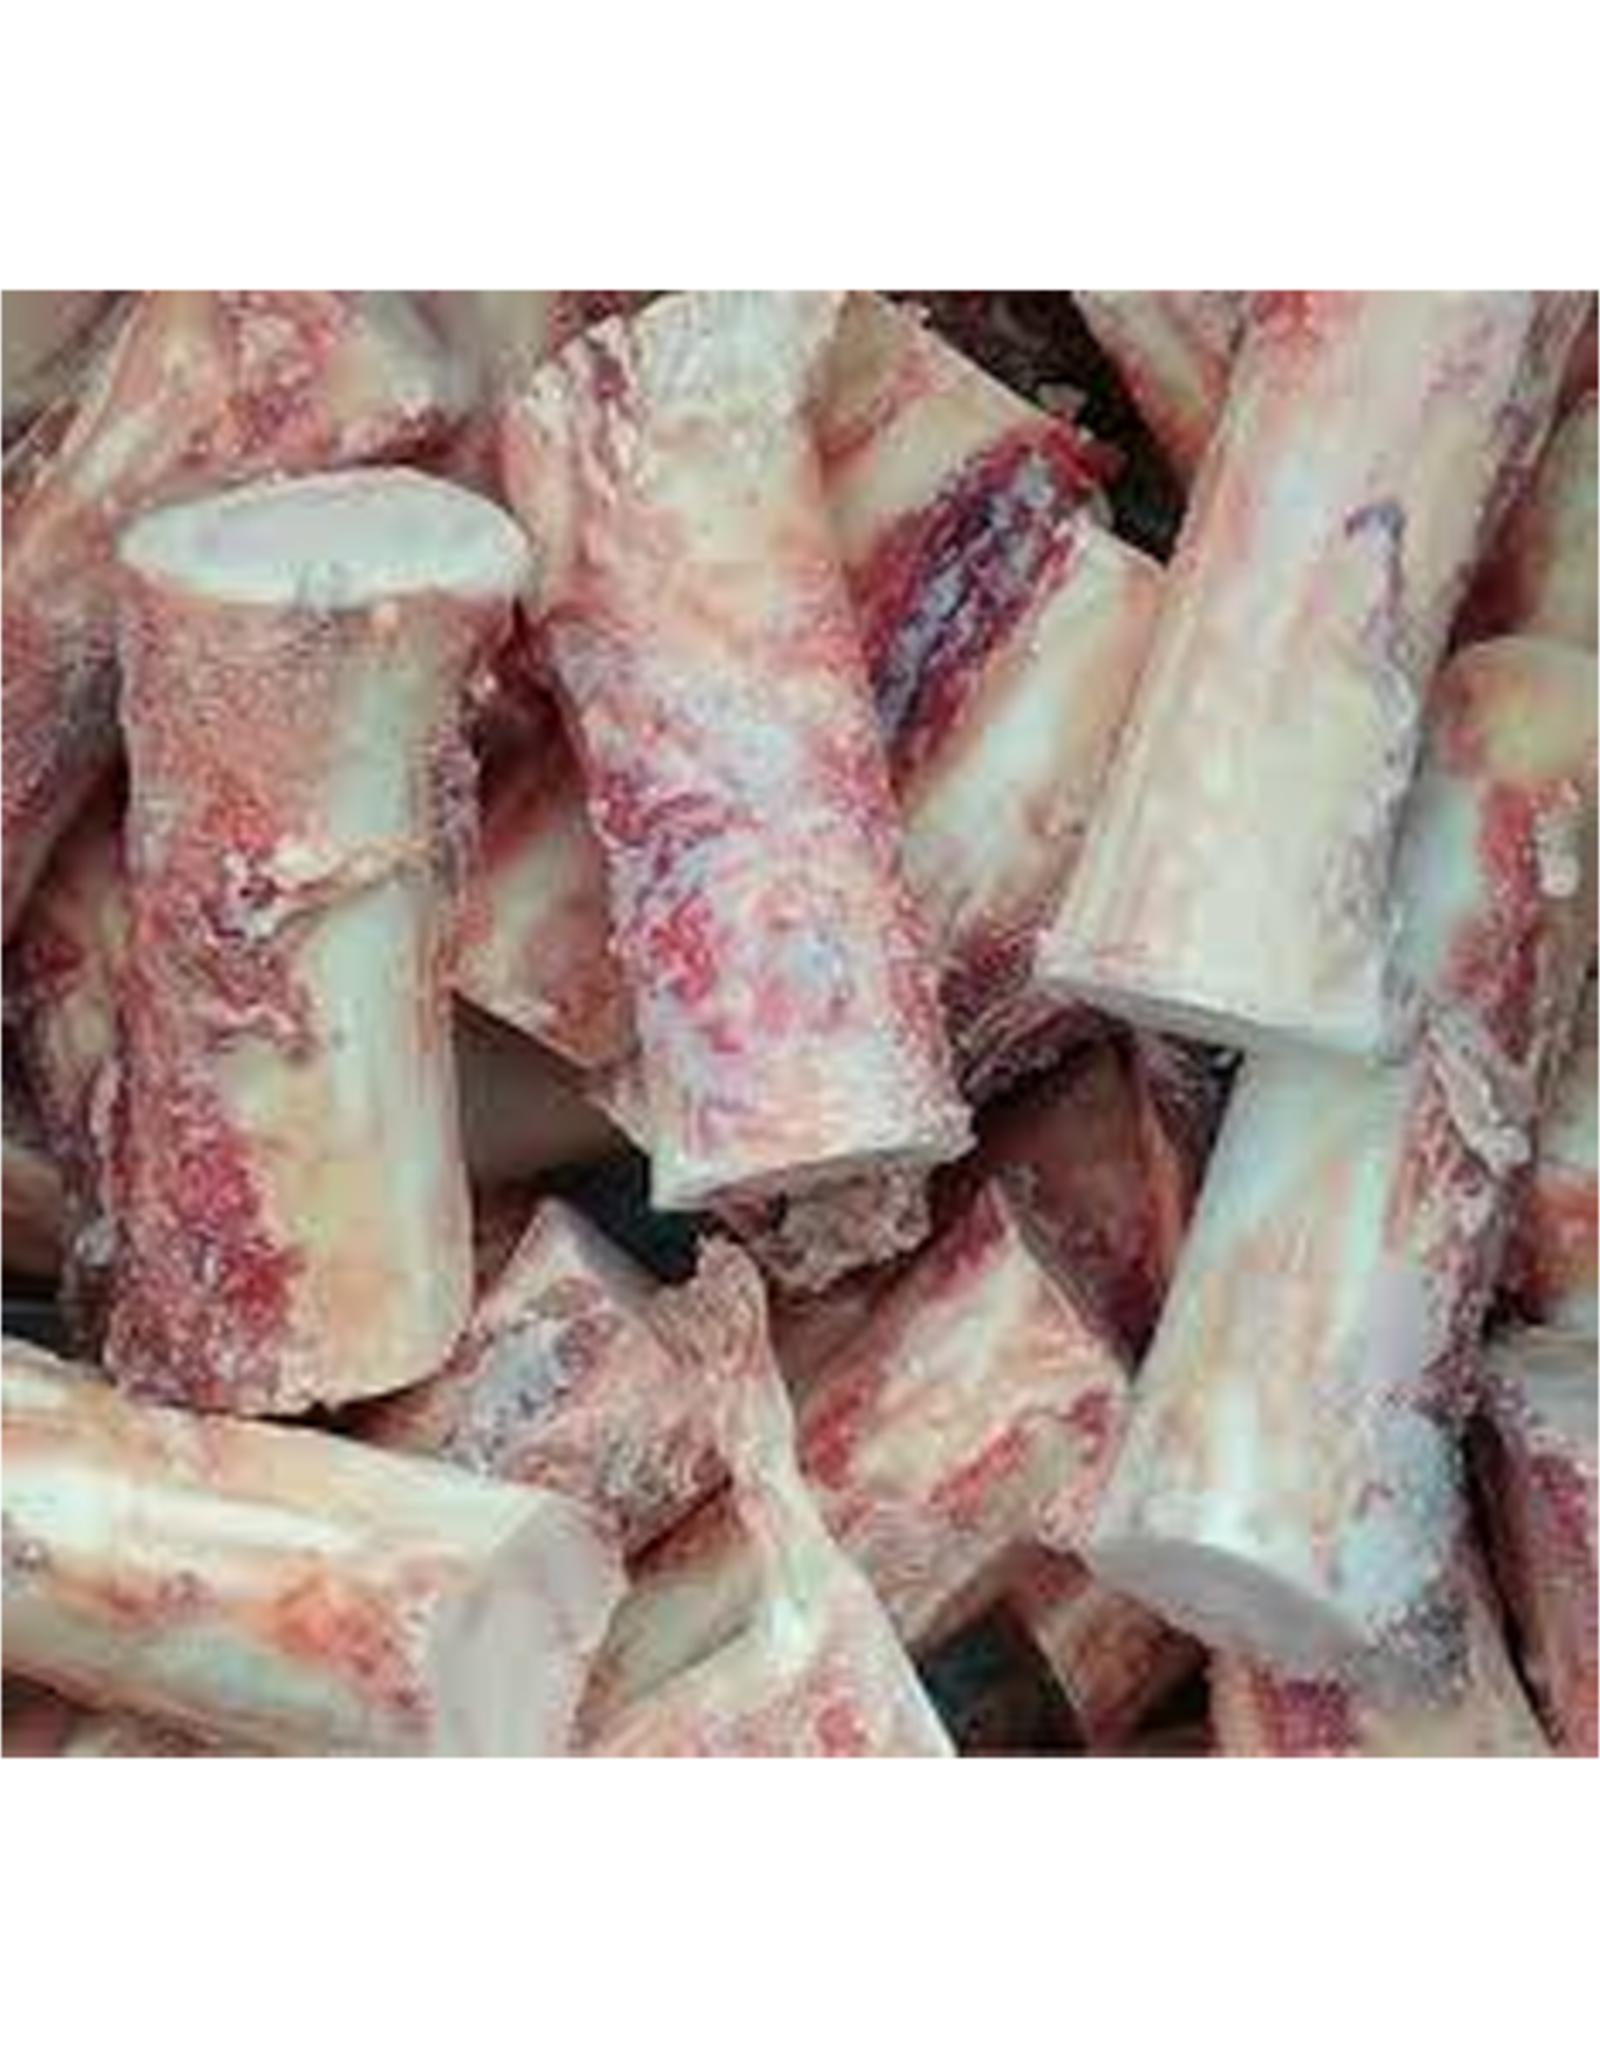 IRON WILL RAW Iron Will Raw Dog Beef Marrow Bone LG (Single)